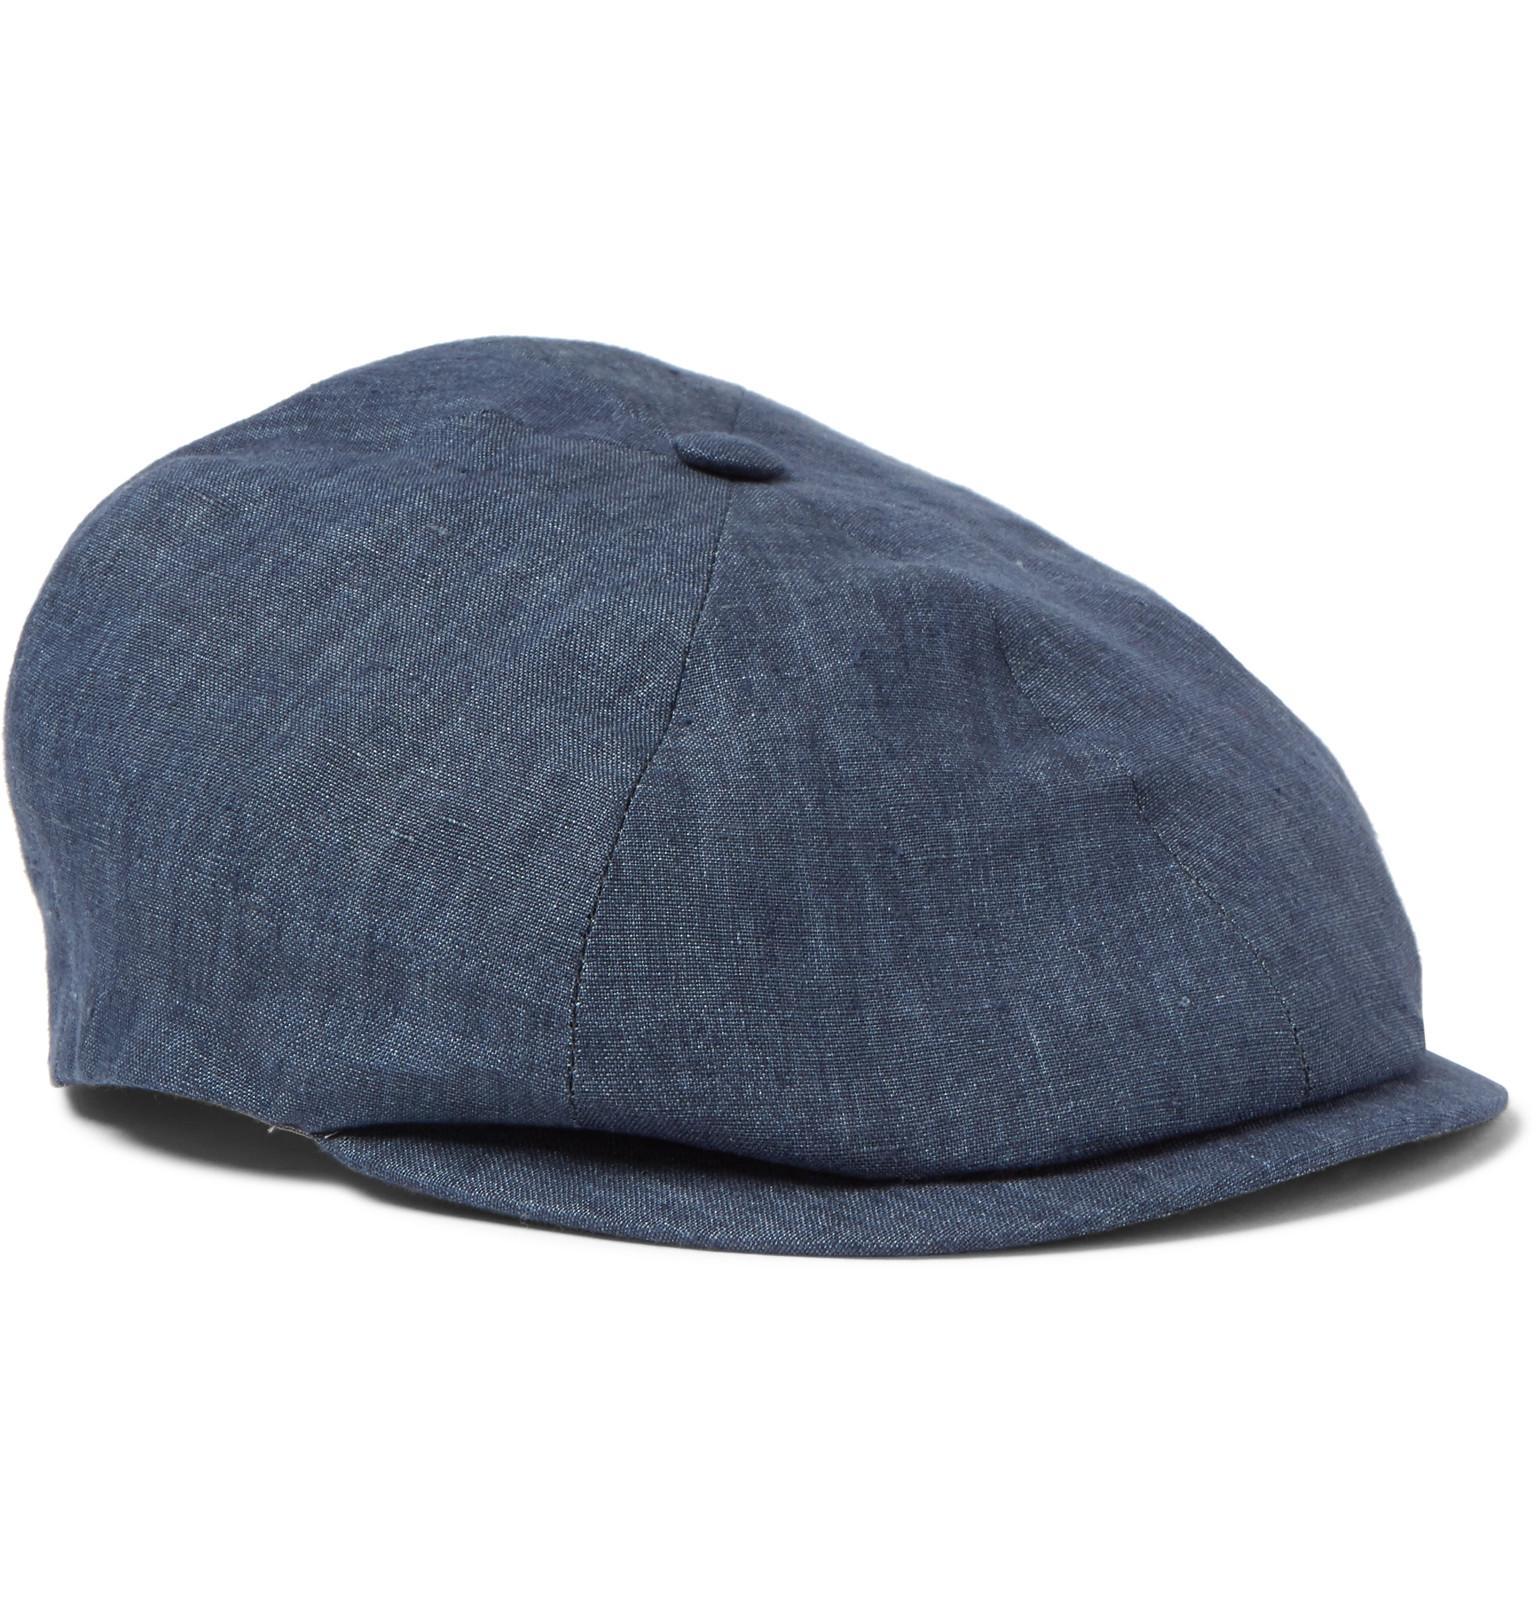 Reverb Linen-chambray Flat Cap Lock & Co Hatters UWtGkJ